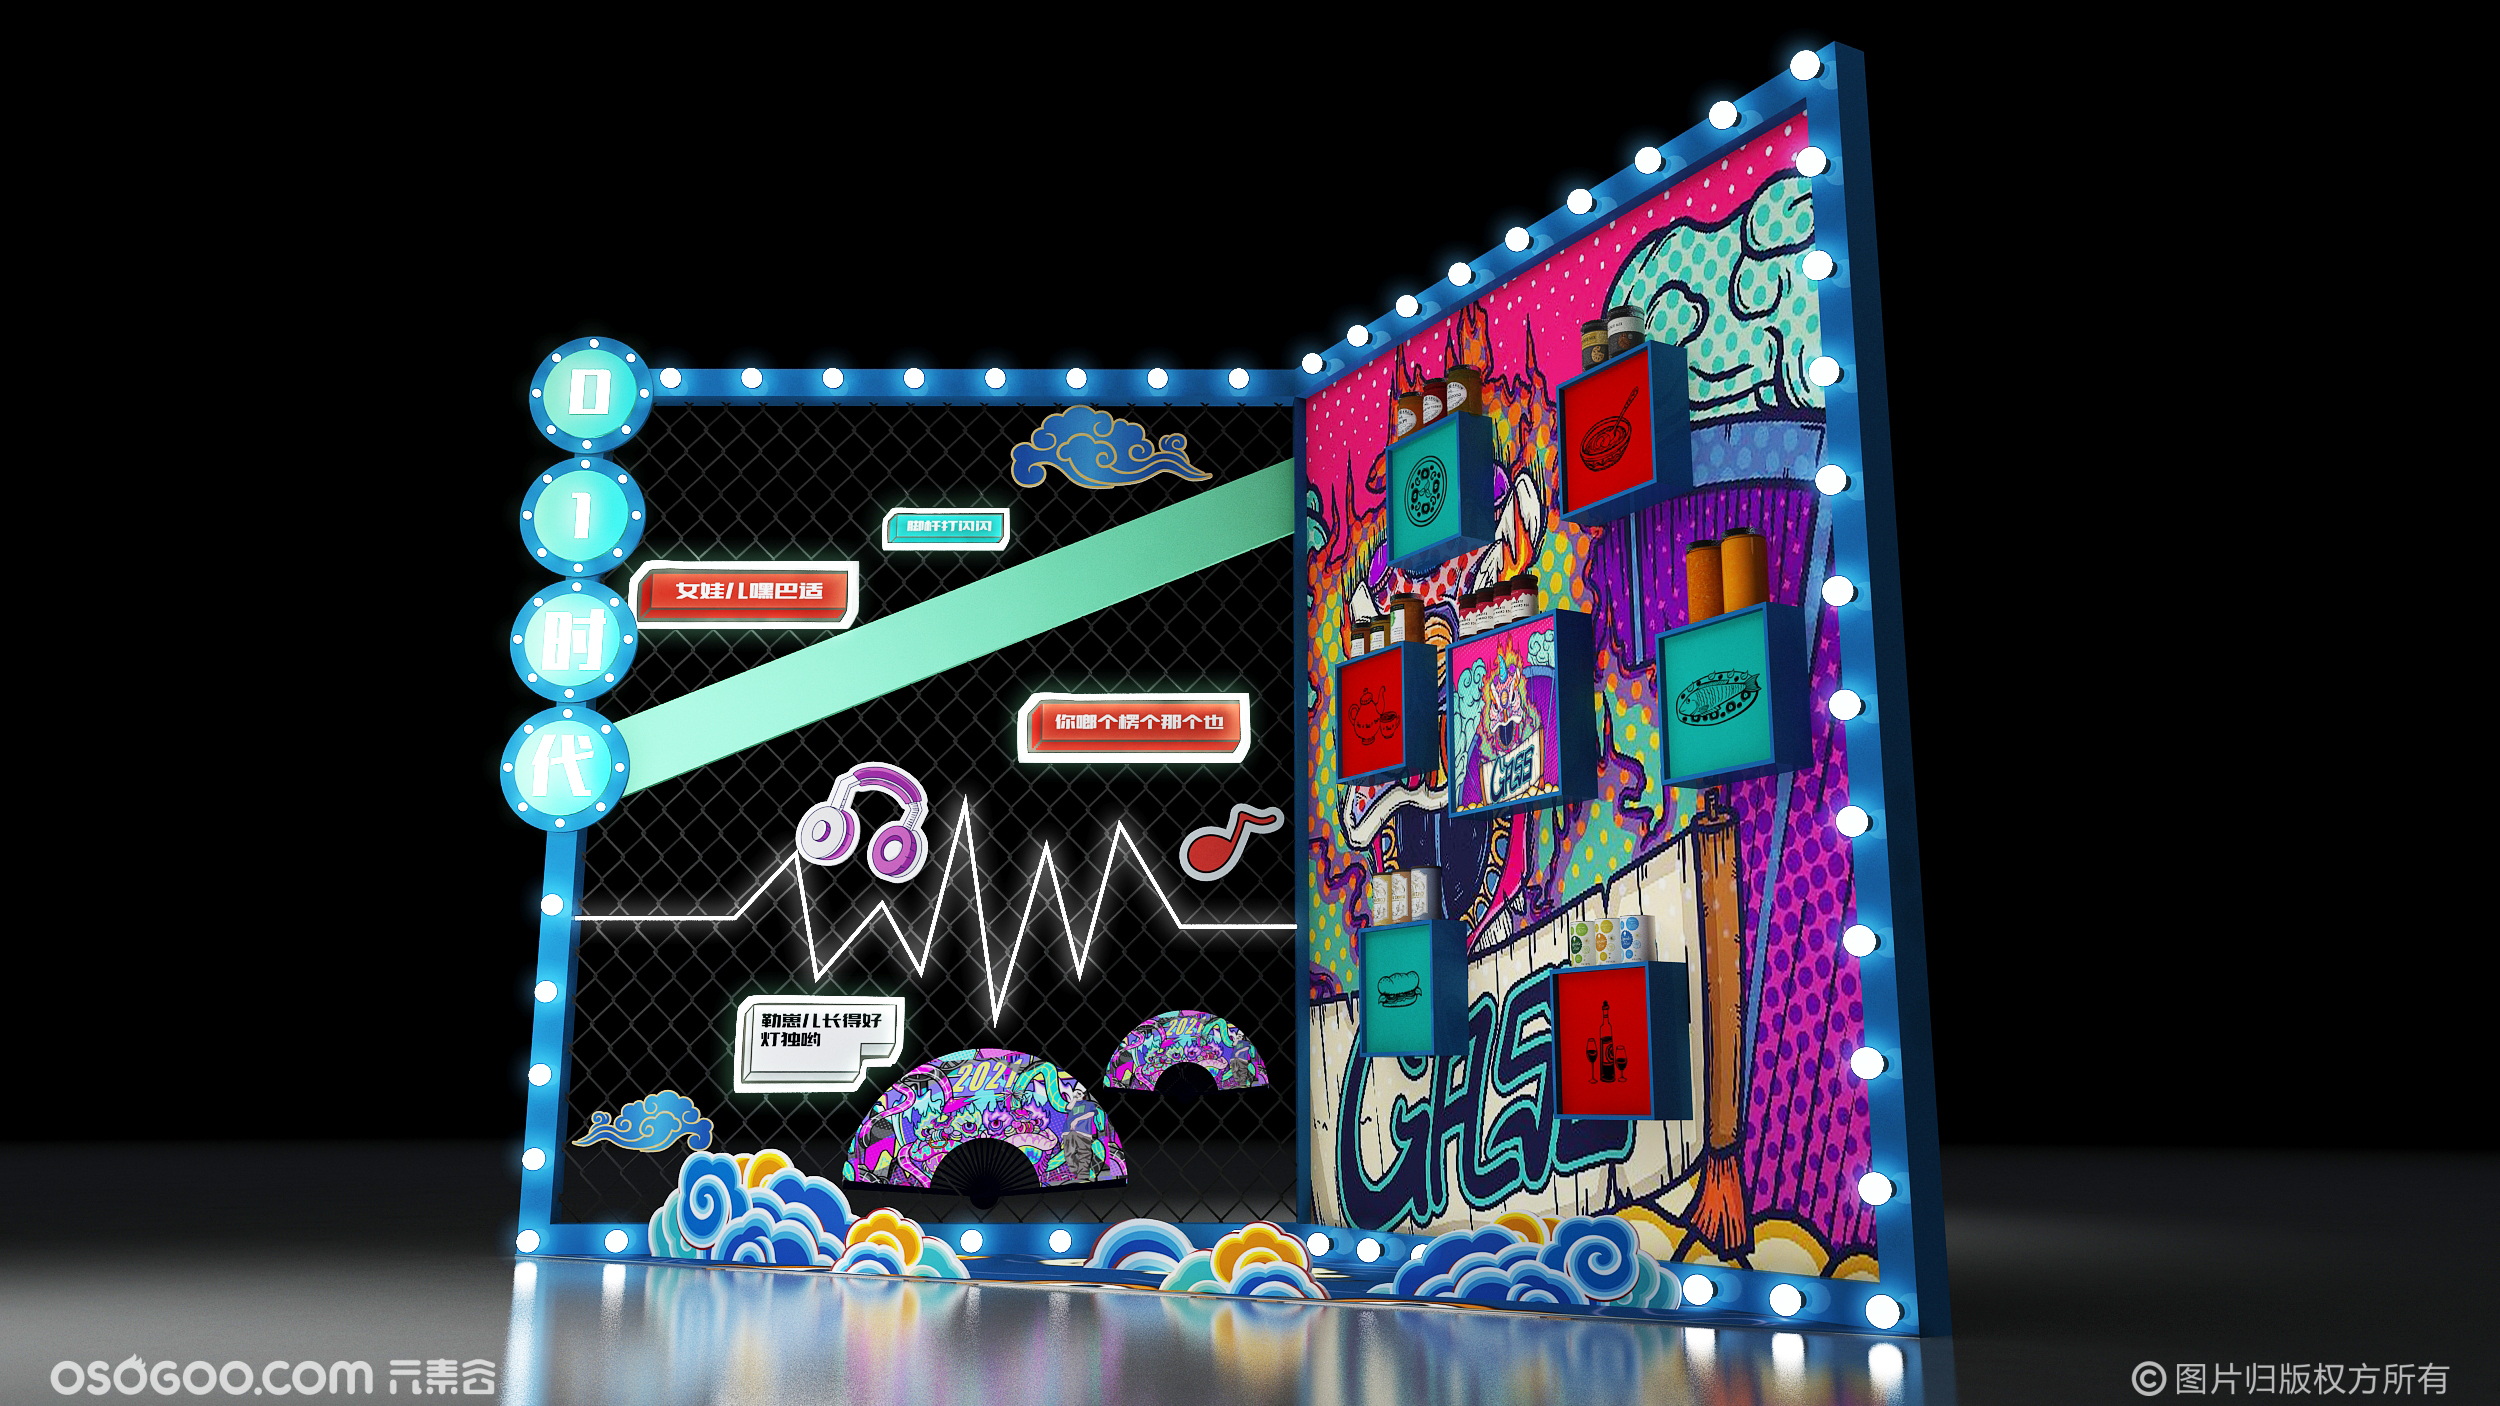 3D设计效果图▪2021商场国潮DP拍照美陈场景空间打卡点